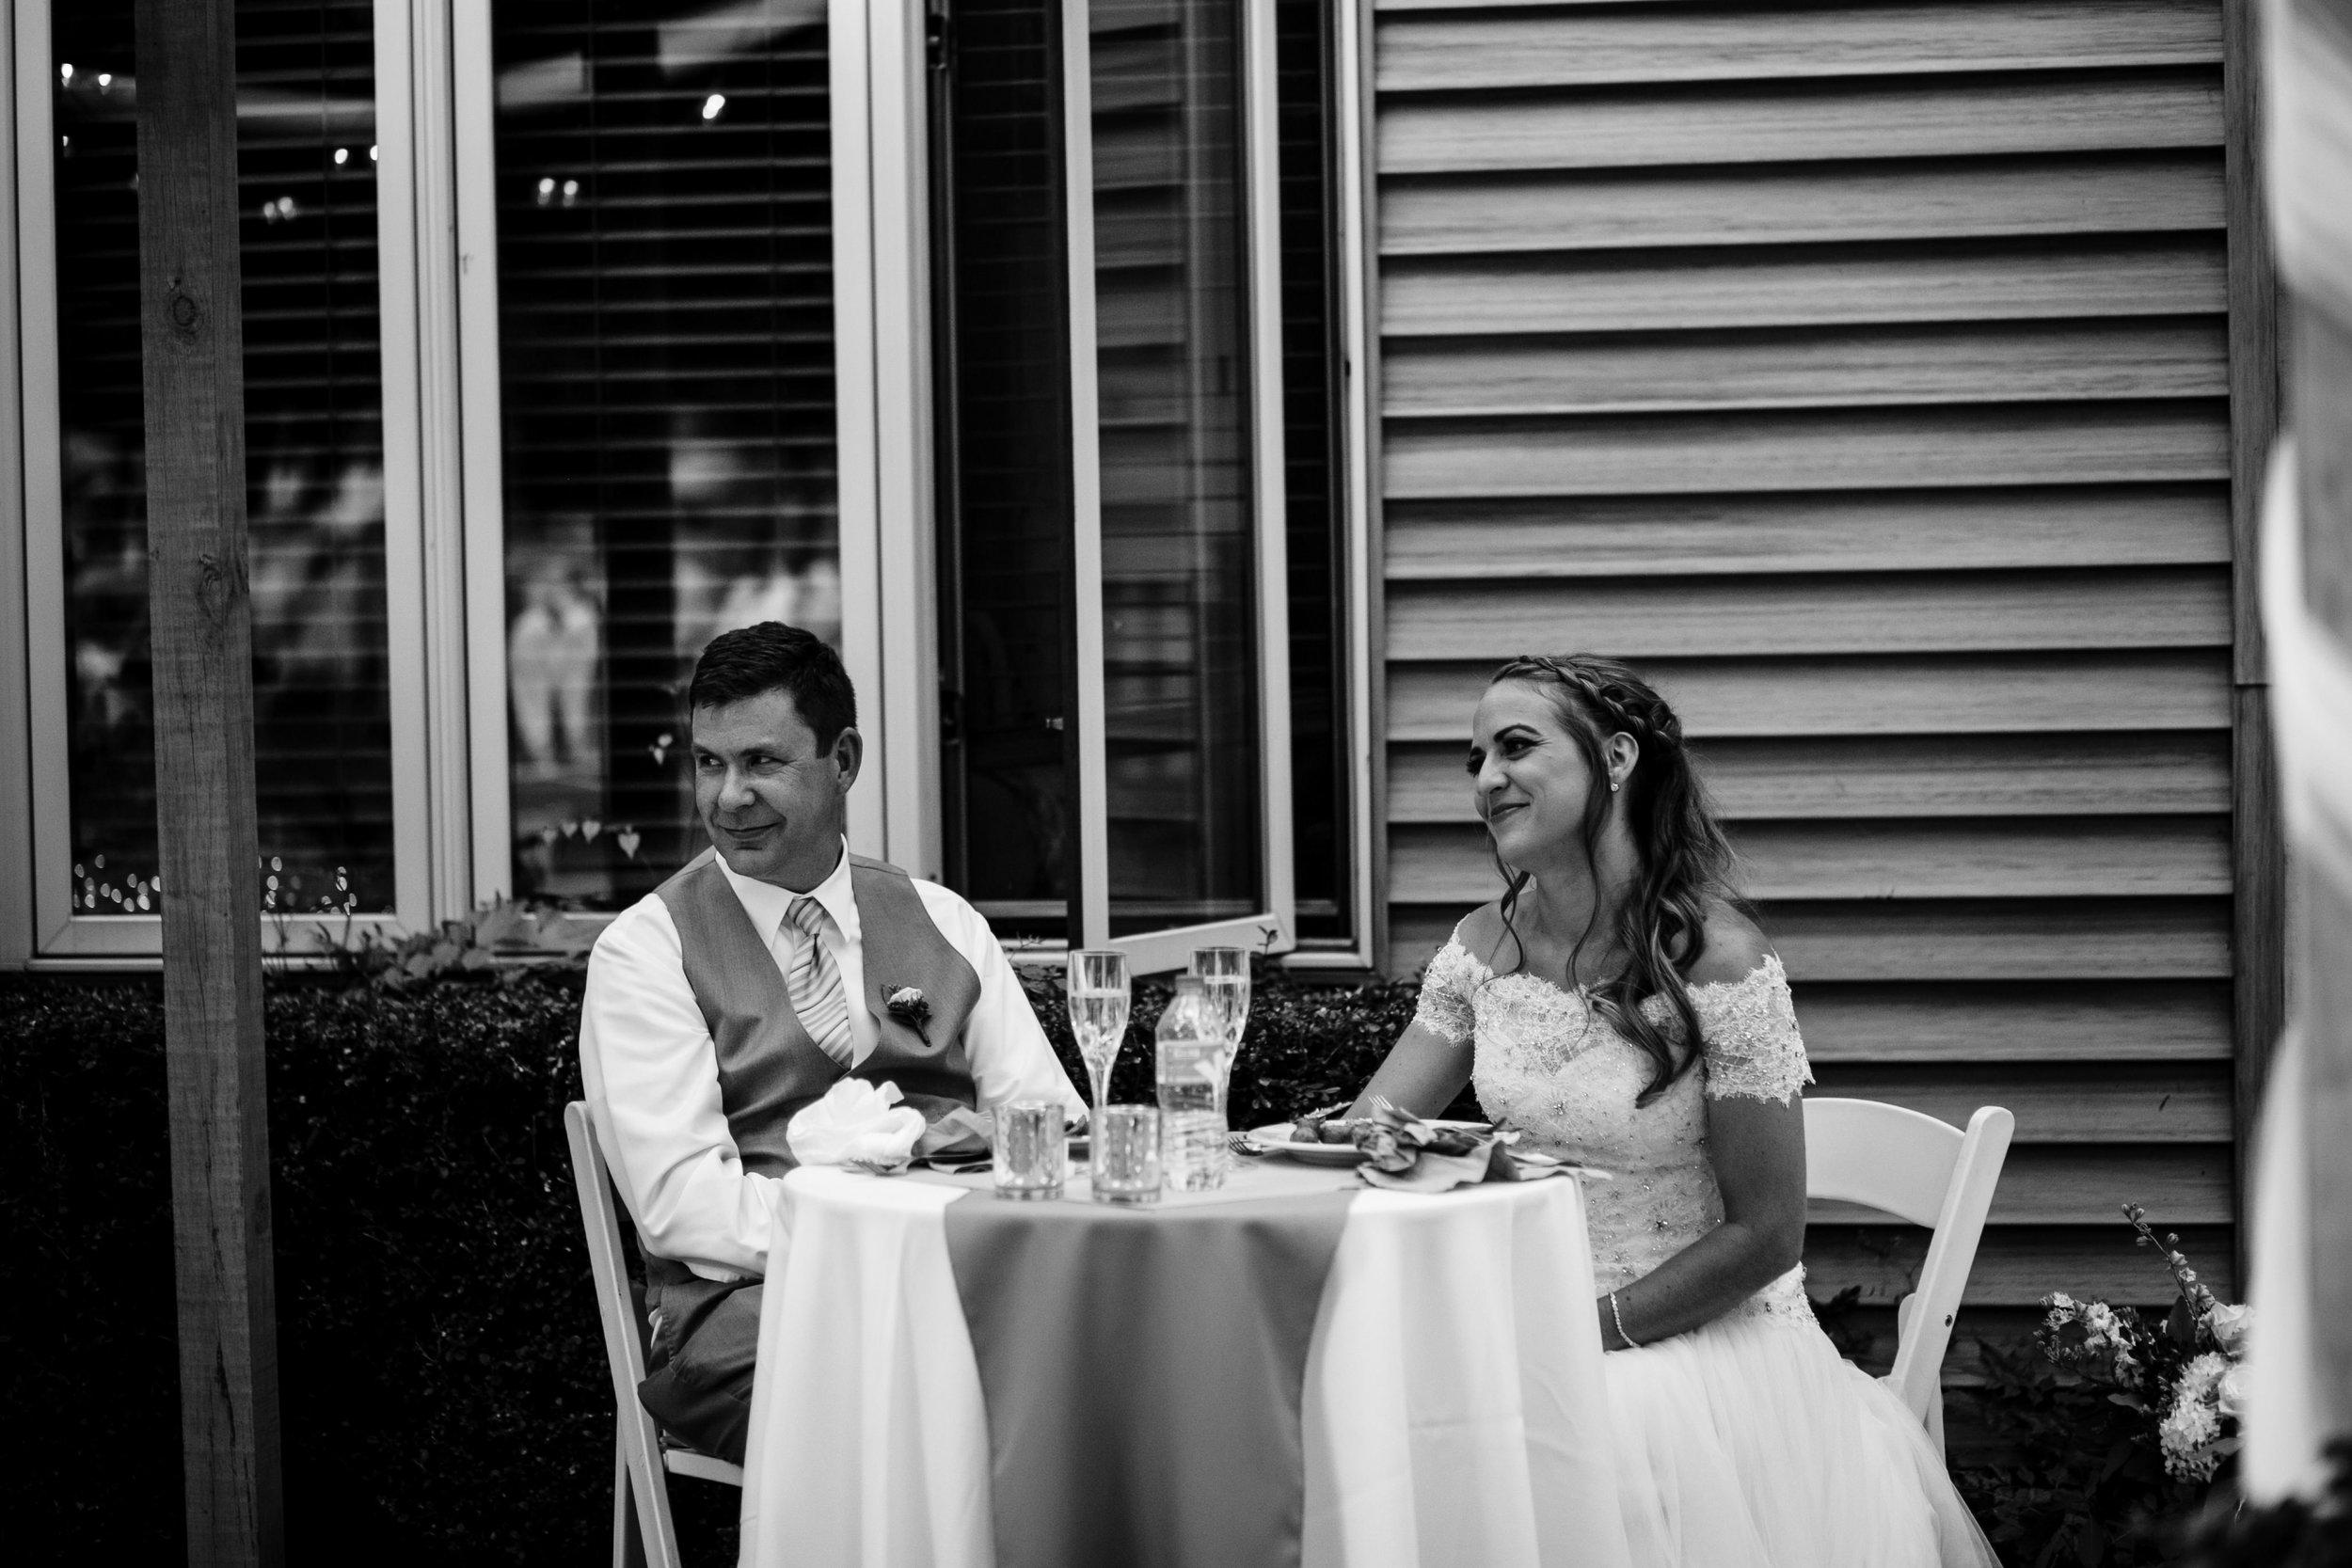 ludington-michigan-intimate-backyard-wedding-jessica-nolan416.jpg